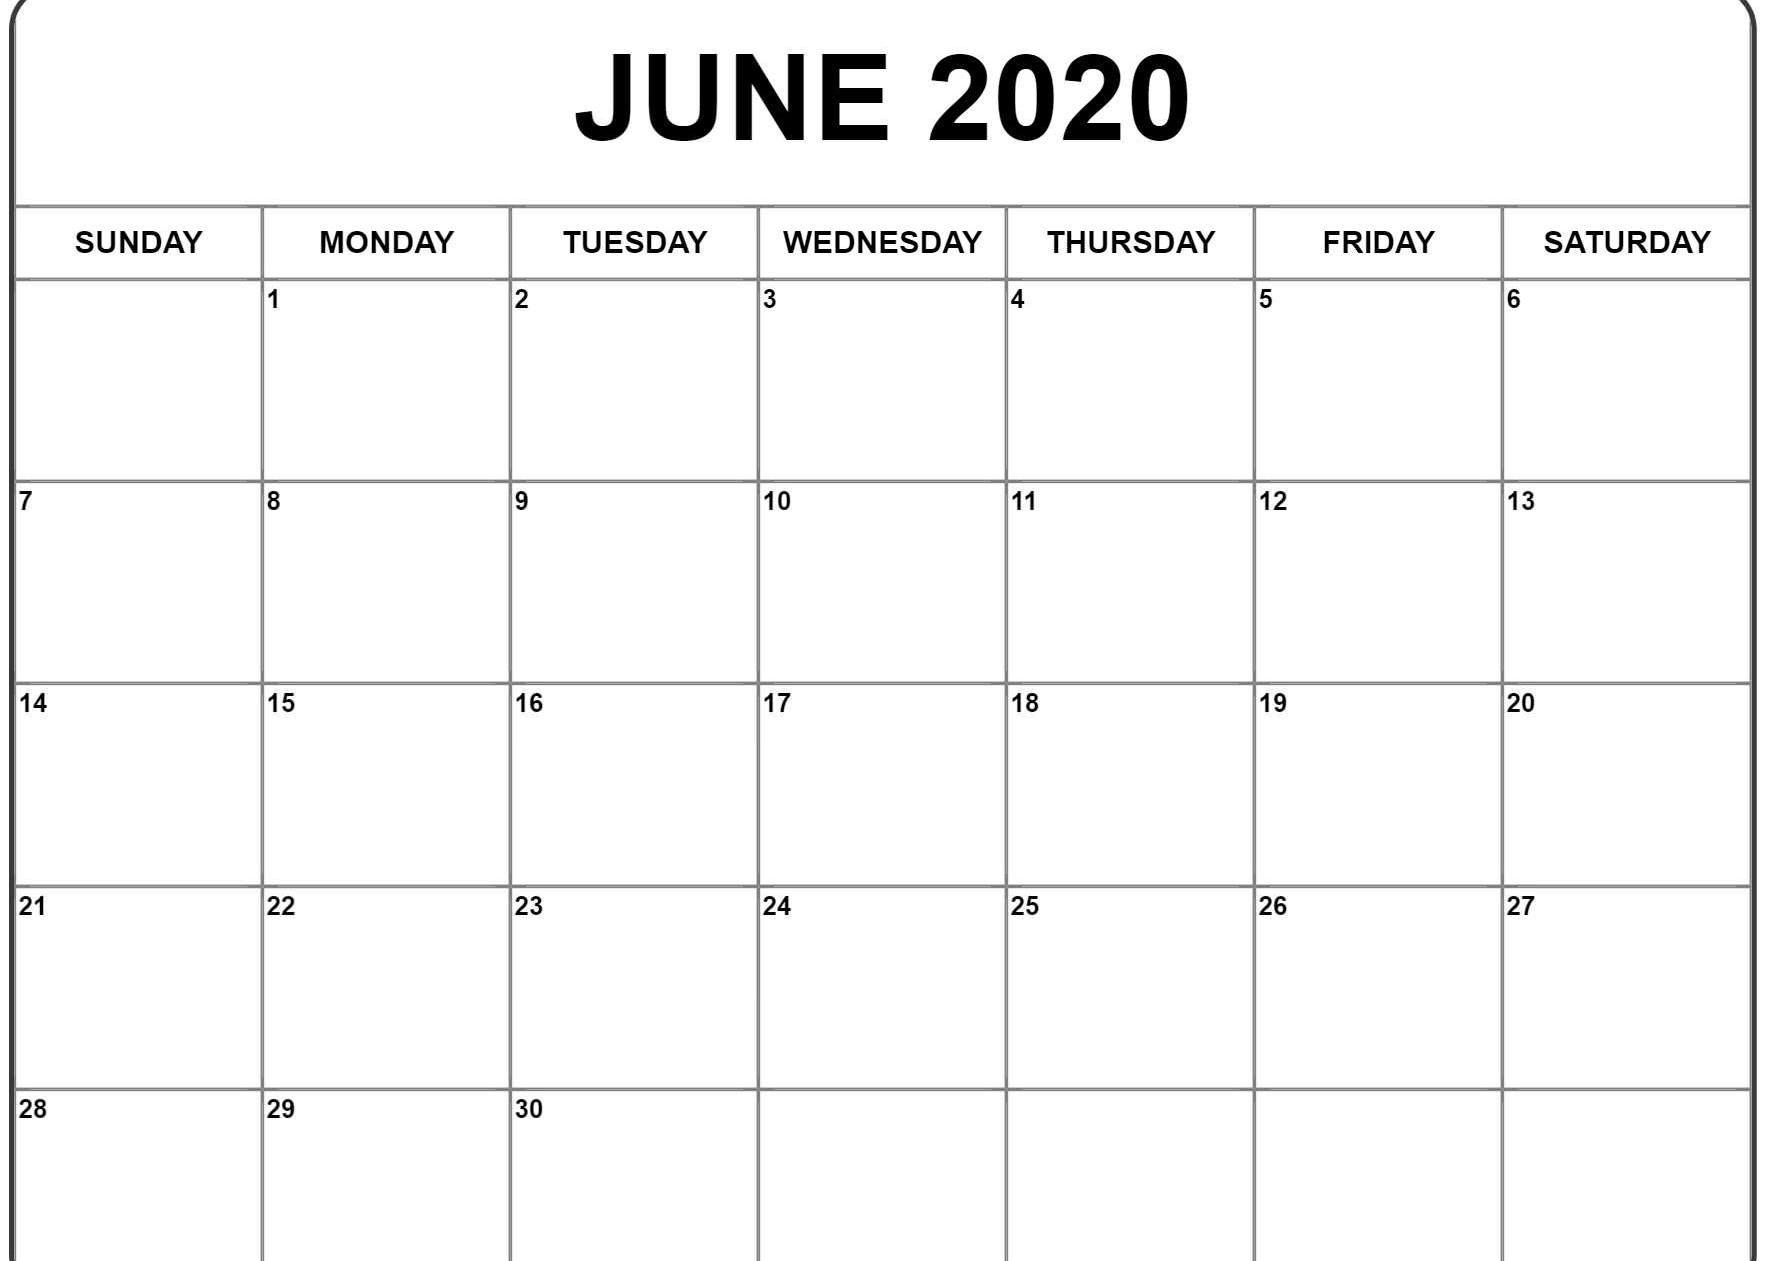 June 2020 Calendar | Printable Calendar Template, Father's in Free Calendar 2020 Starting With Mondays